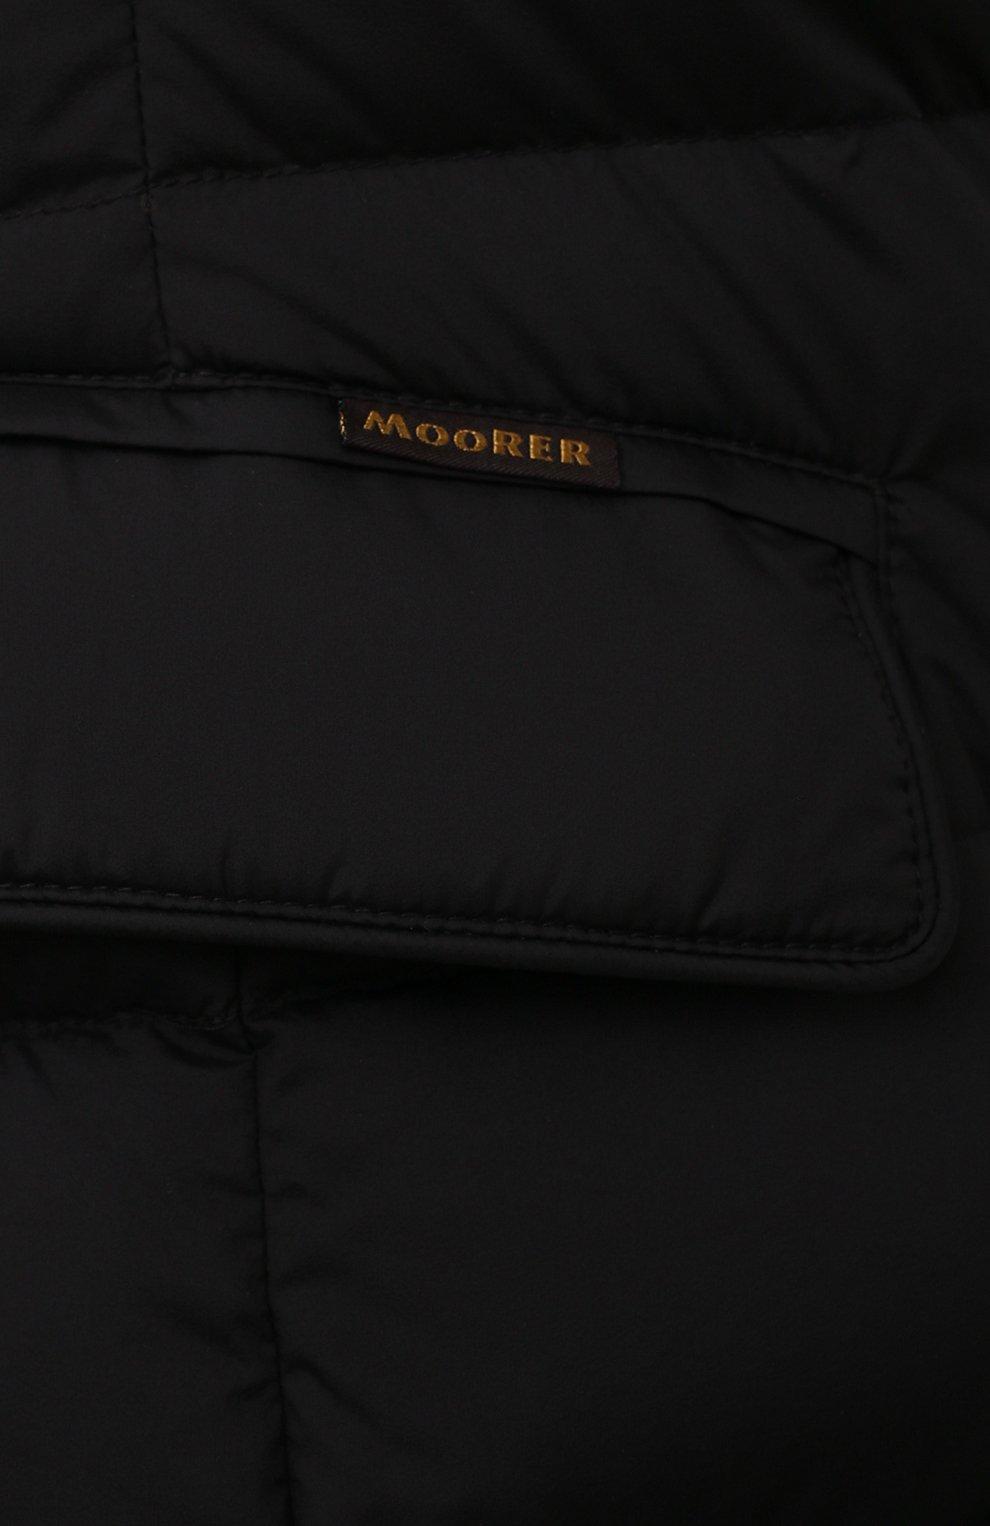 Мужская пуховая куртка zayn-op MOORER черного цвета, арт. ZAYN-0P/M0UGI100307-TEPA017/60-68   Фото 5 (Кросс-КТ: Куртка, Пуховик; Мужское Кросс-КТ: пуховик-короткий; Рукава: Длинные; Материал внешний: Синтетический материал; Стили: Классический; Материал подклада: Синтетический материал)